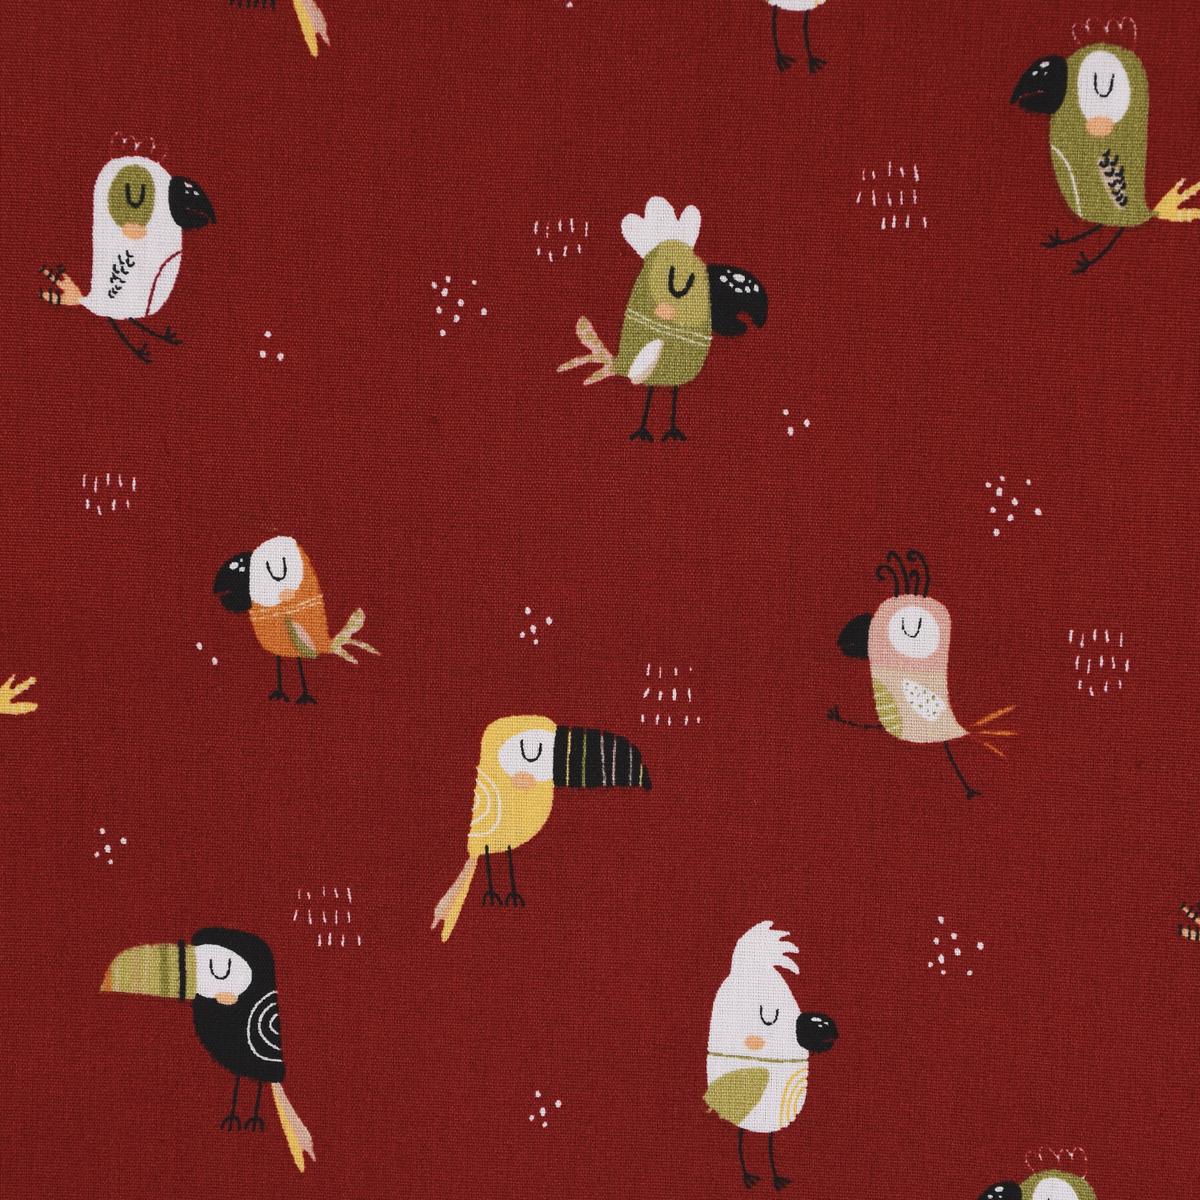 Baumwollstoff Popeline COOL BIRDS Tukan Kakadu dunkelrot bunt 1,45m Breite